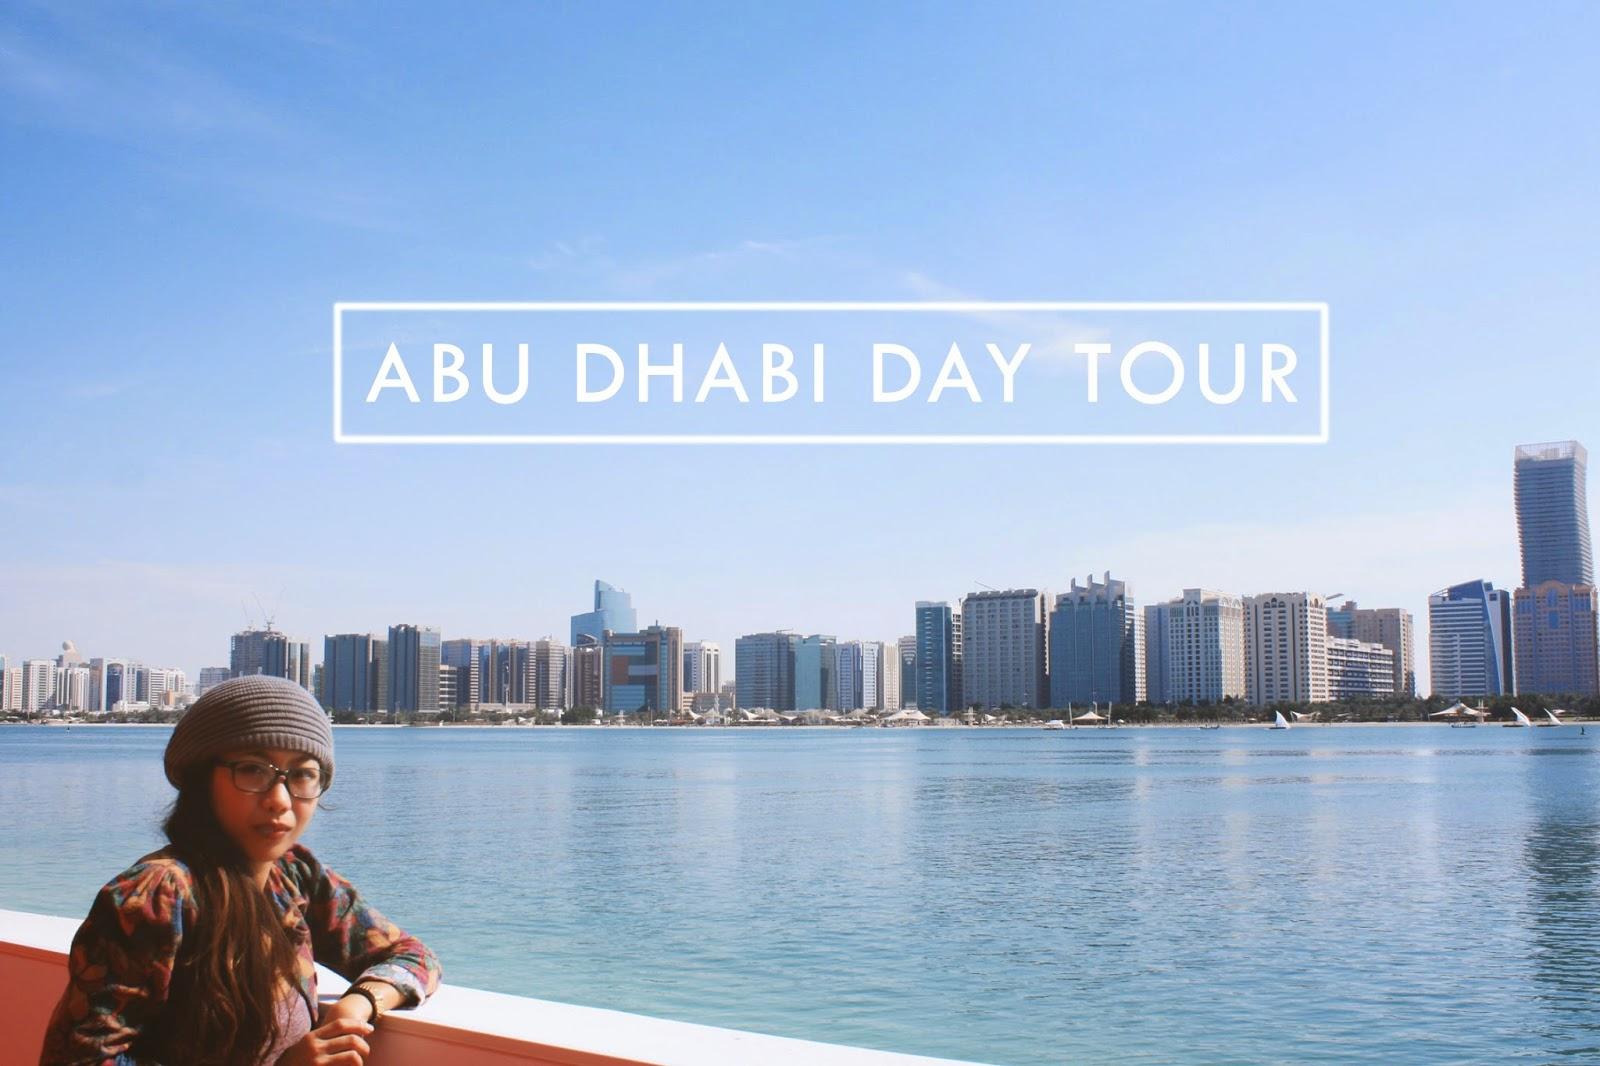 Bus to Abu Dhabi